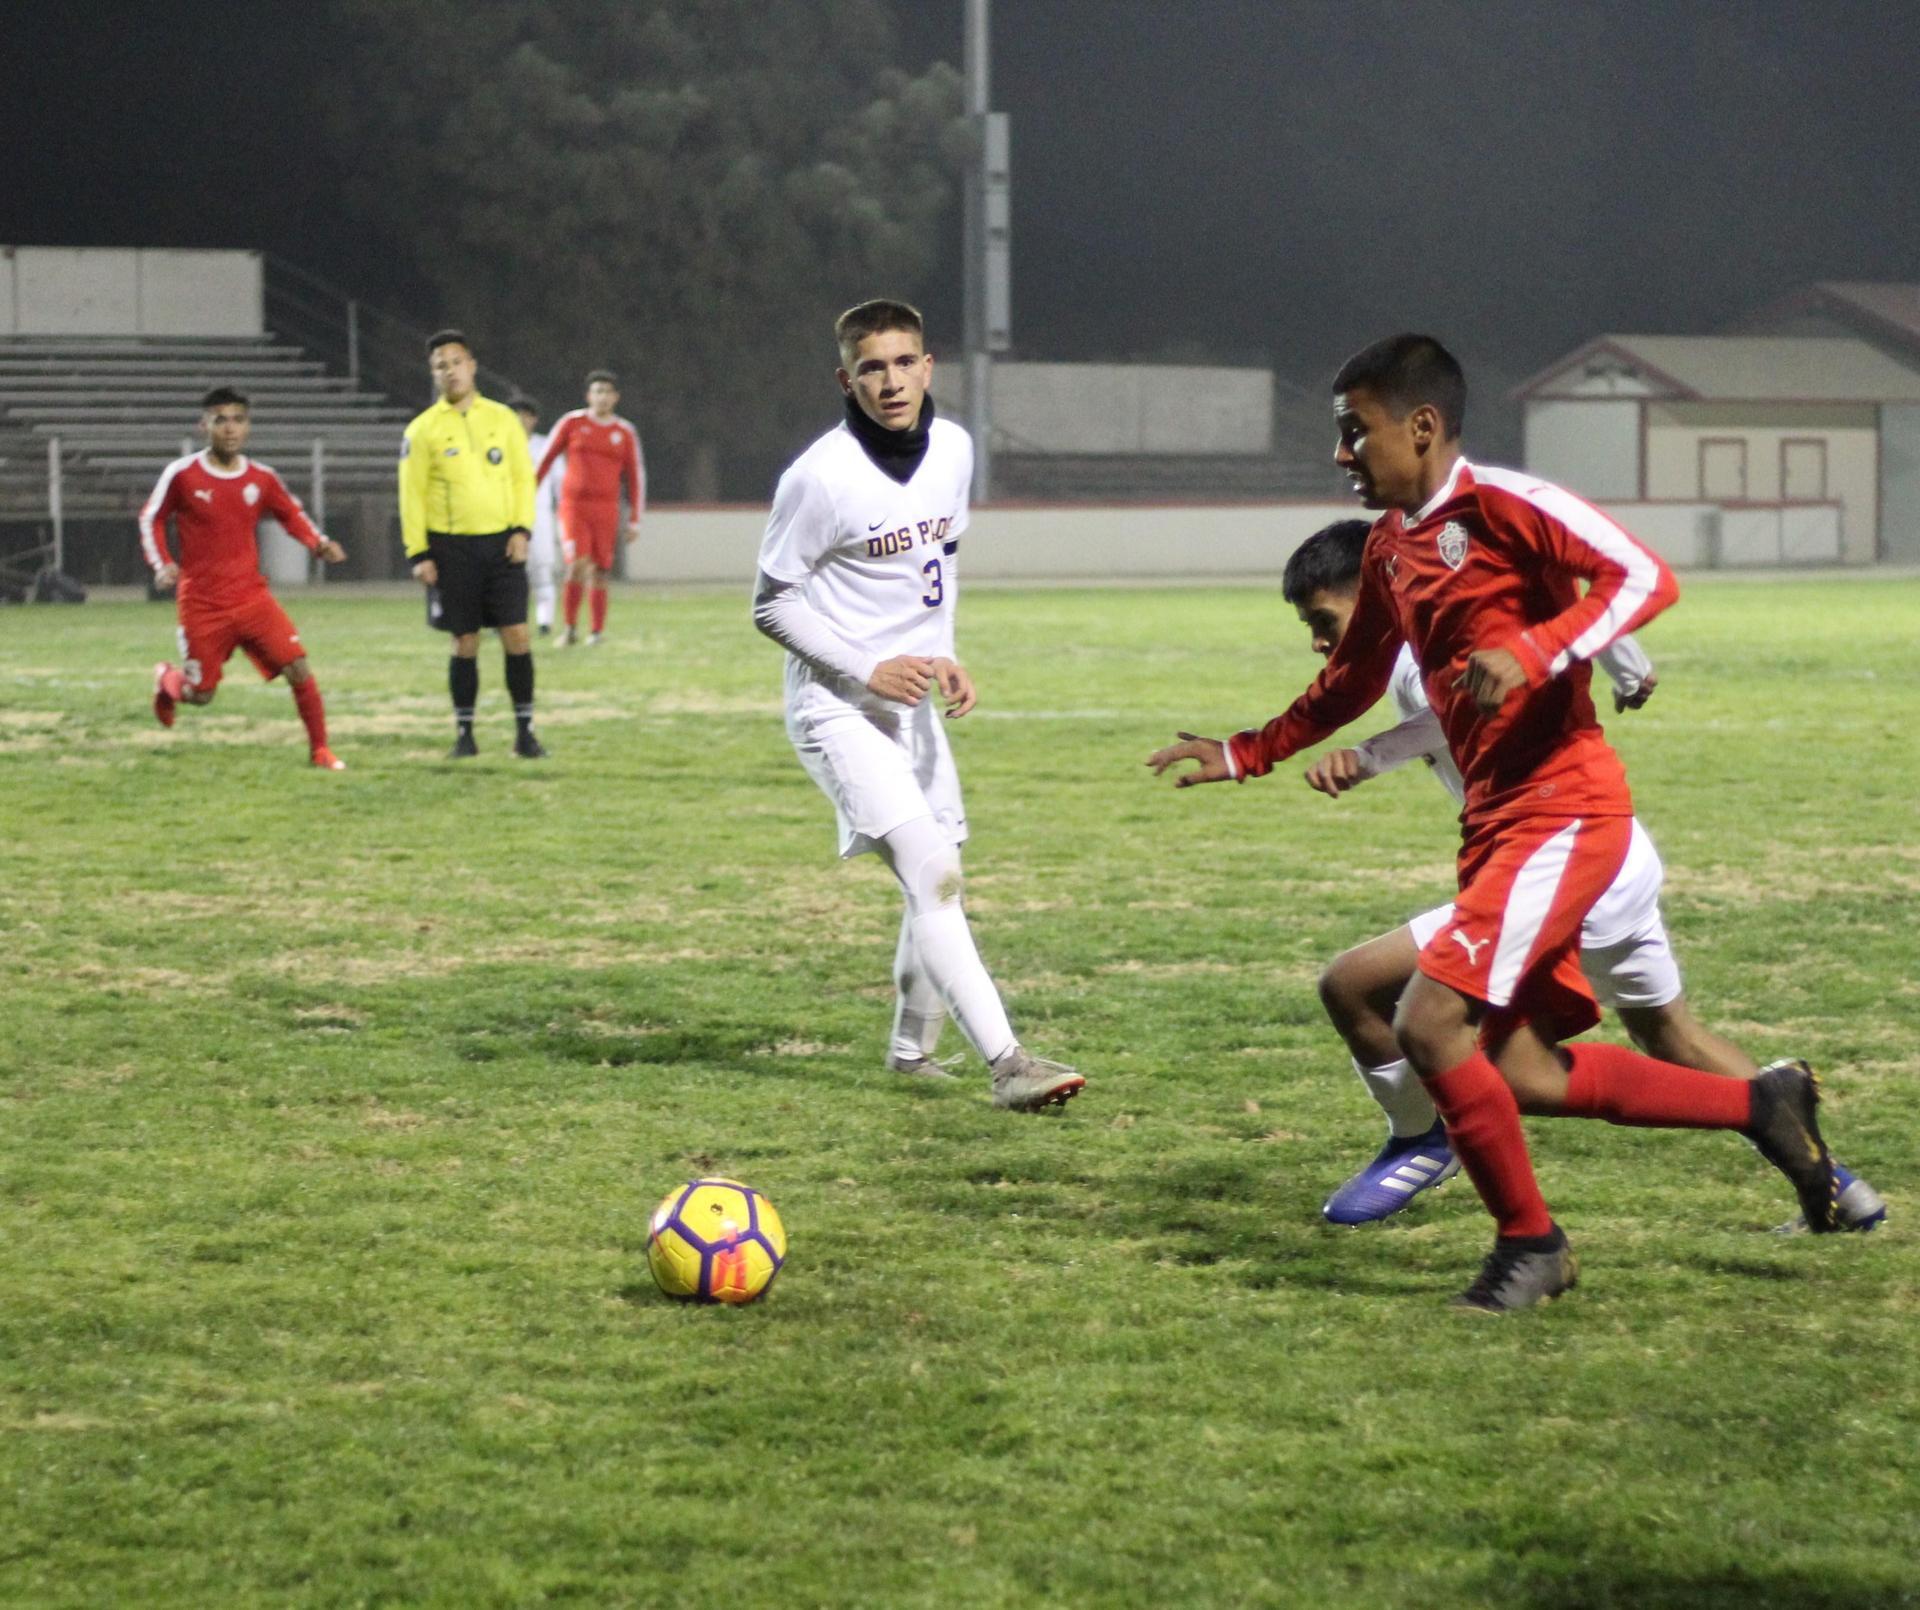 Cesar Galvan running towards the ball